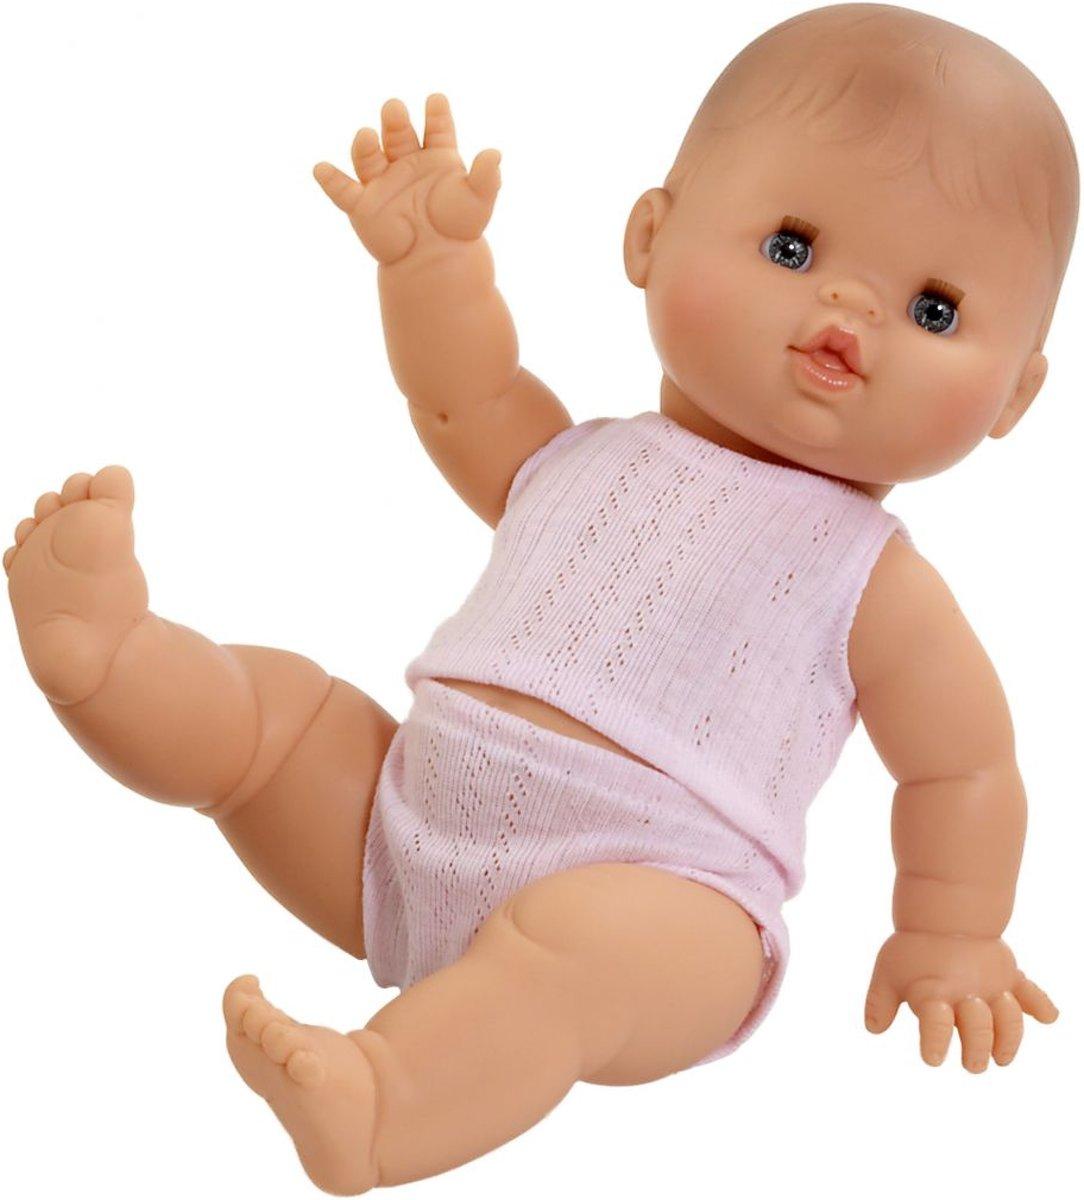 Paola Reina Gordi Babypop Blank Meisje Alicia met ondergoed